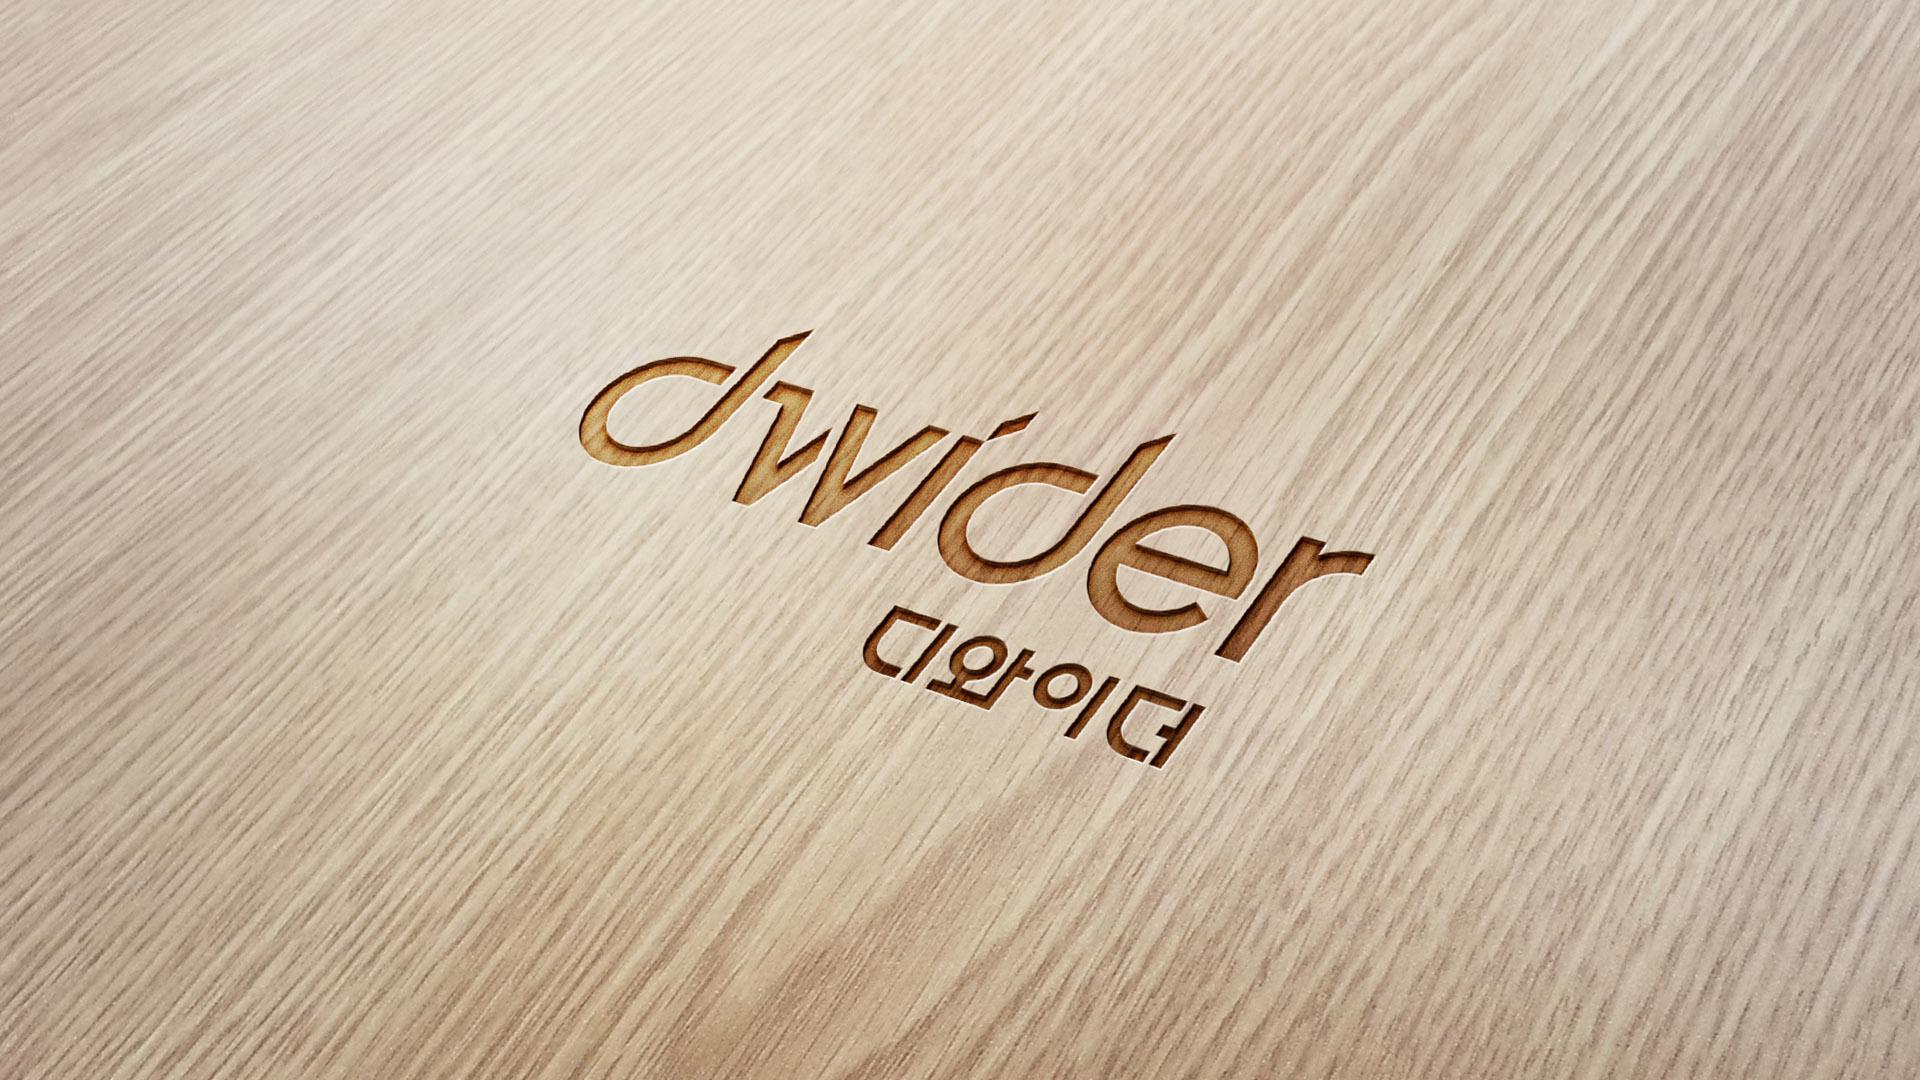 Create a New Paradigm, DWIDER.